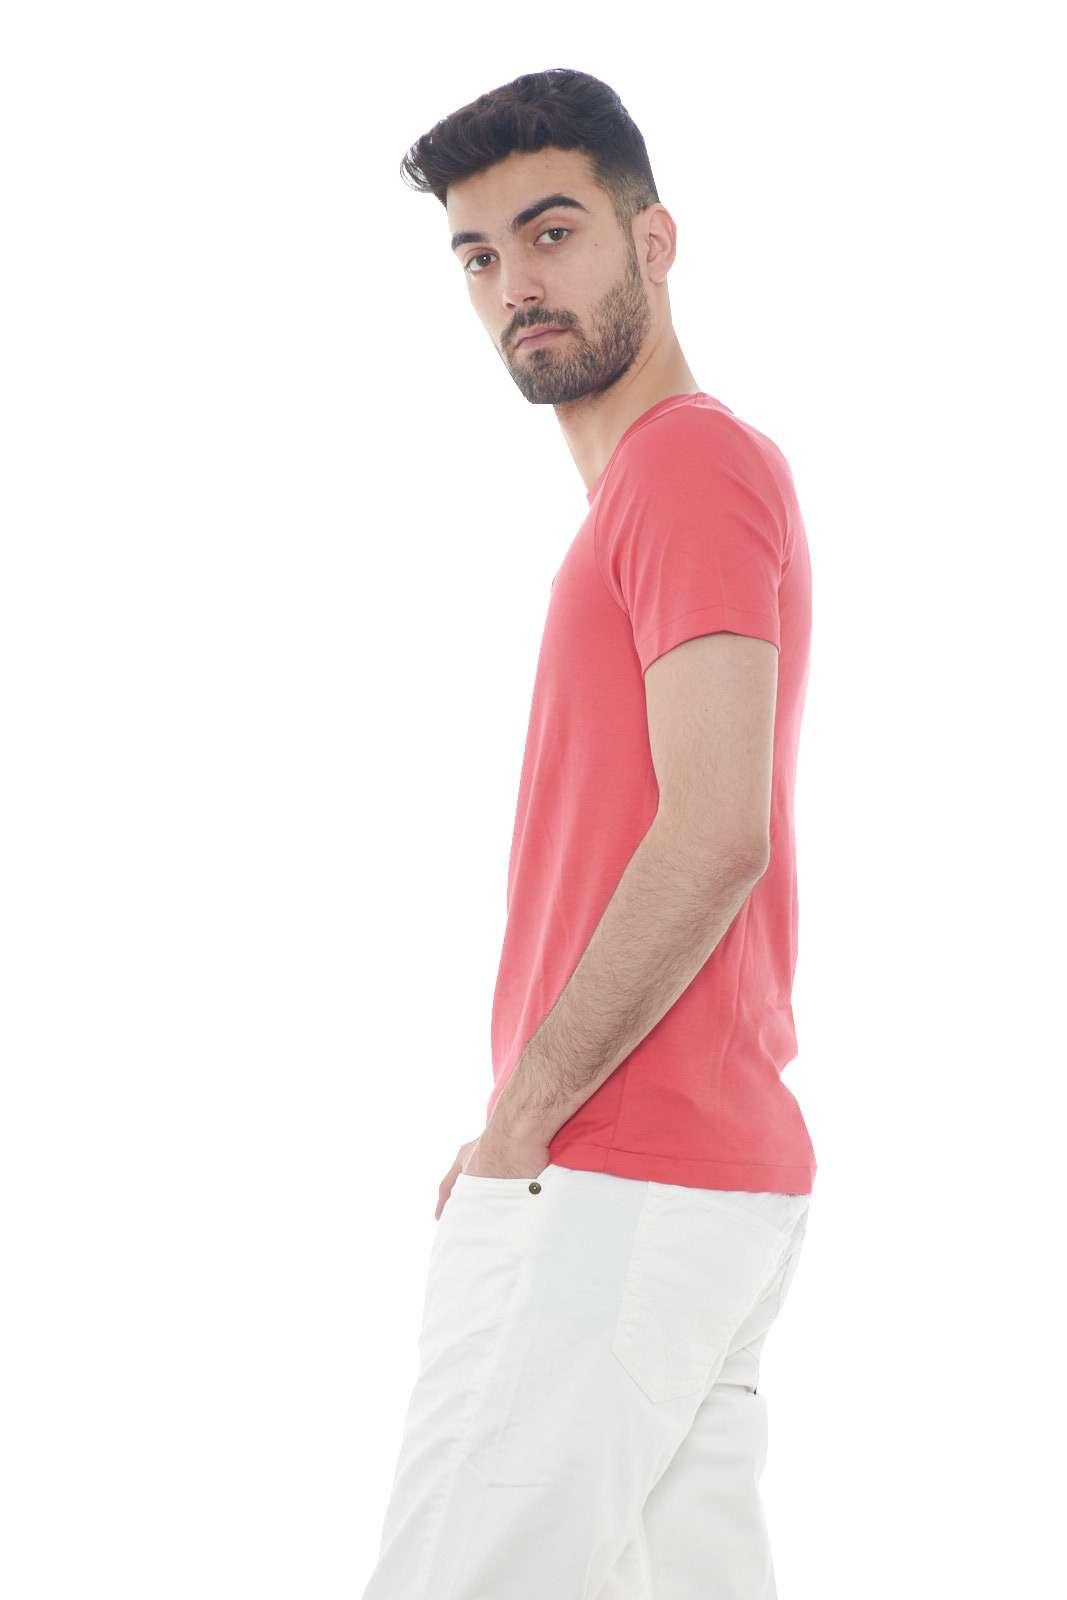 https://www.parmax.com/media/catalog/product/a/i/PE-outlet_parmax-t-shirt-uomo-Ralph-Lauren-710740727-B.jpg